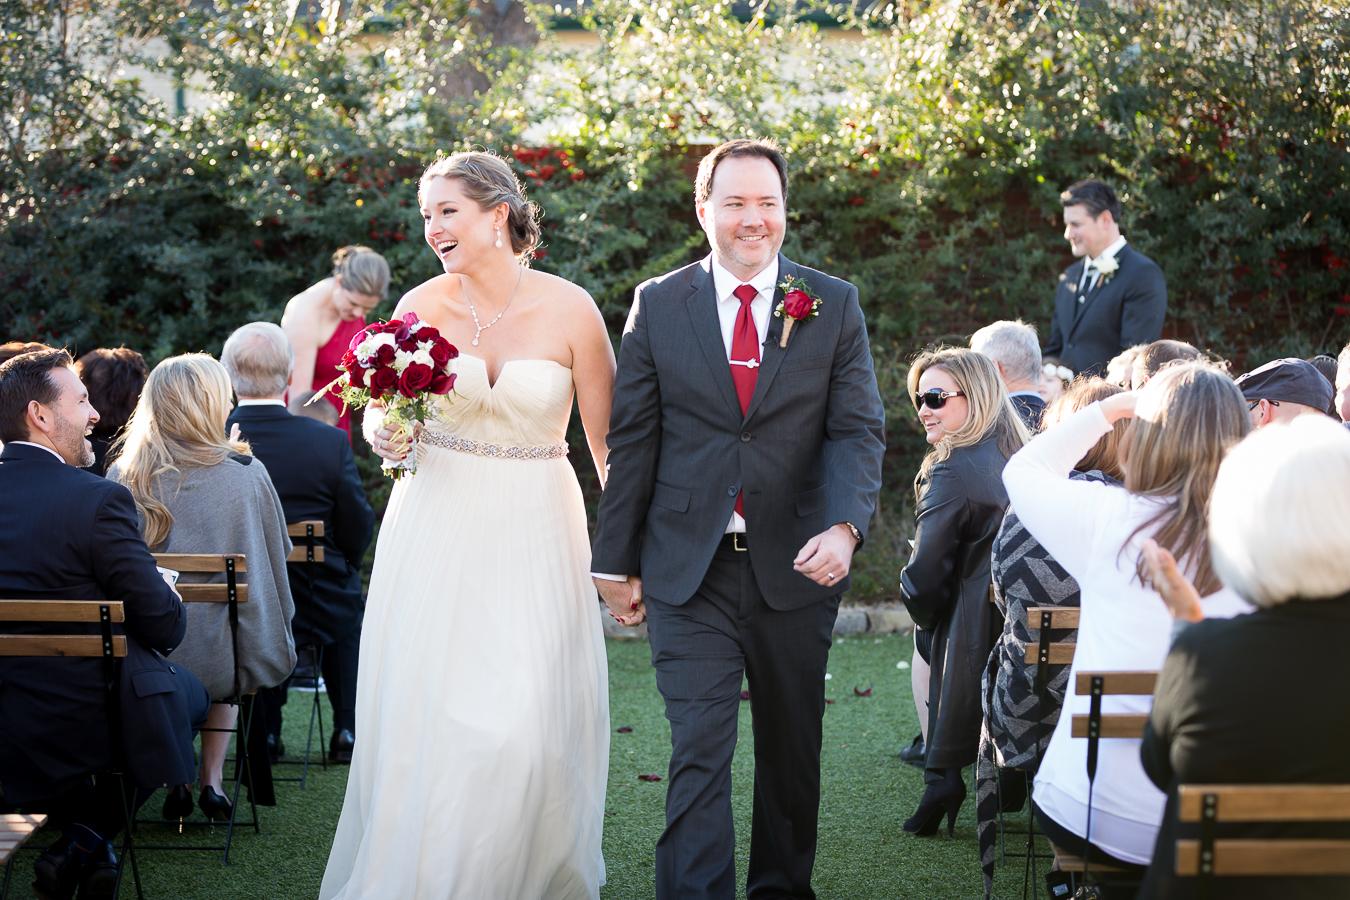 union-on-eighth-wedding-photographs-007.jpg